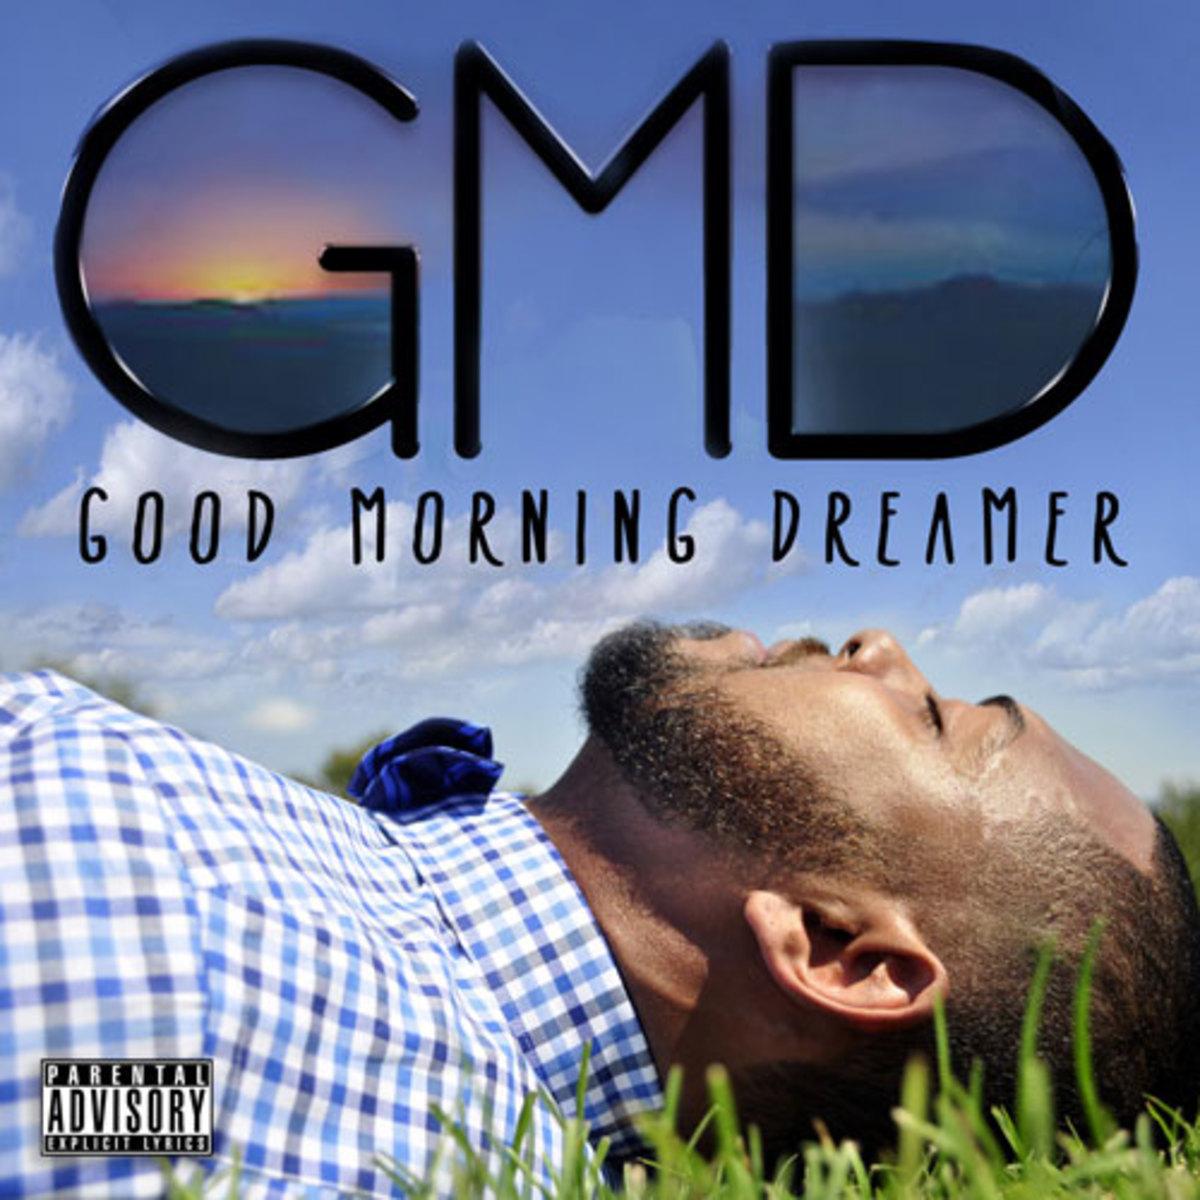 rio-goodmorningdreamer.jpg